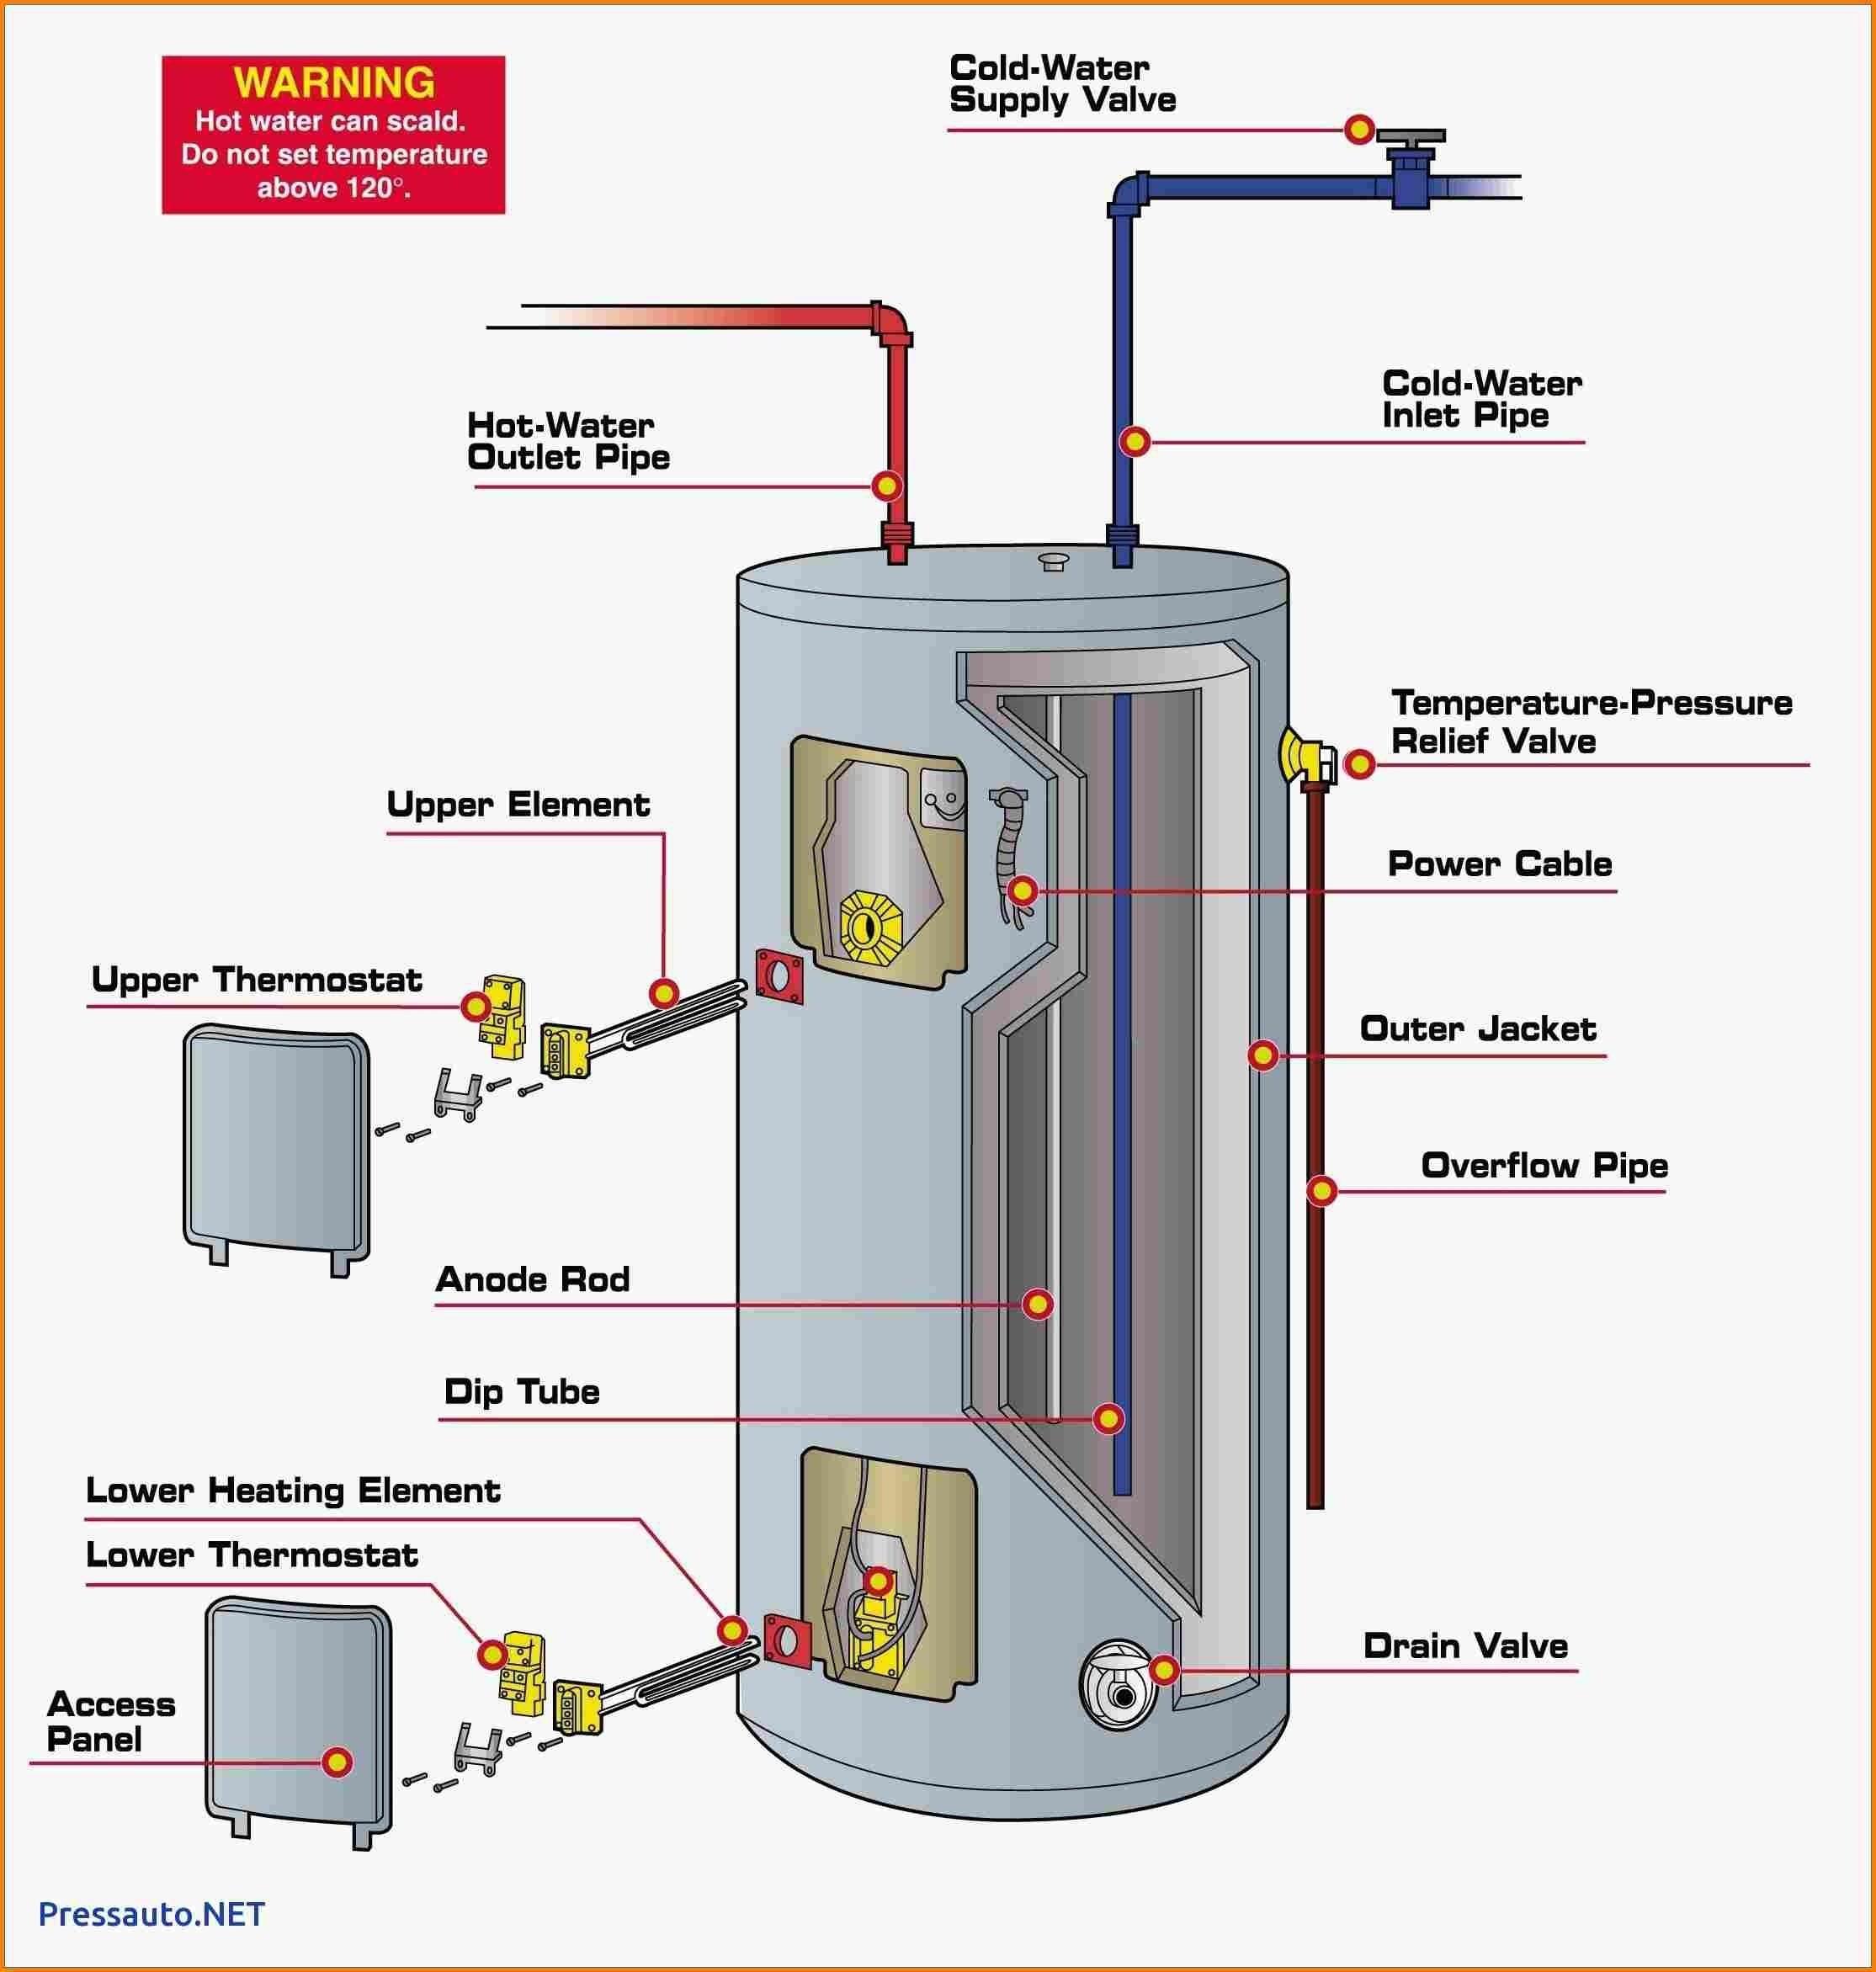 Electric Water Heater Wiring Diagram Wiring Diagram Electric Hot Water Heater Best Water Heater Wiring Of Electric Water Heater Wiring Diagram